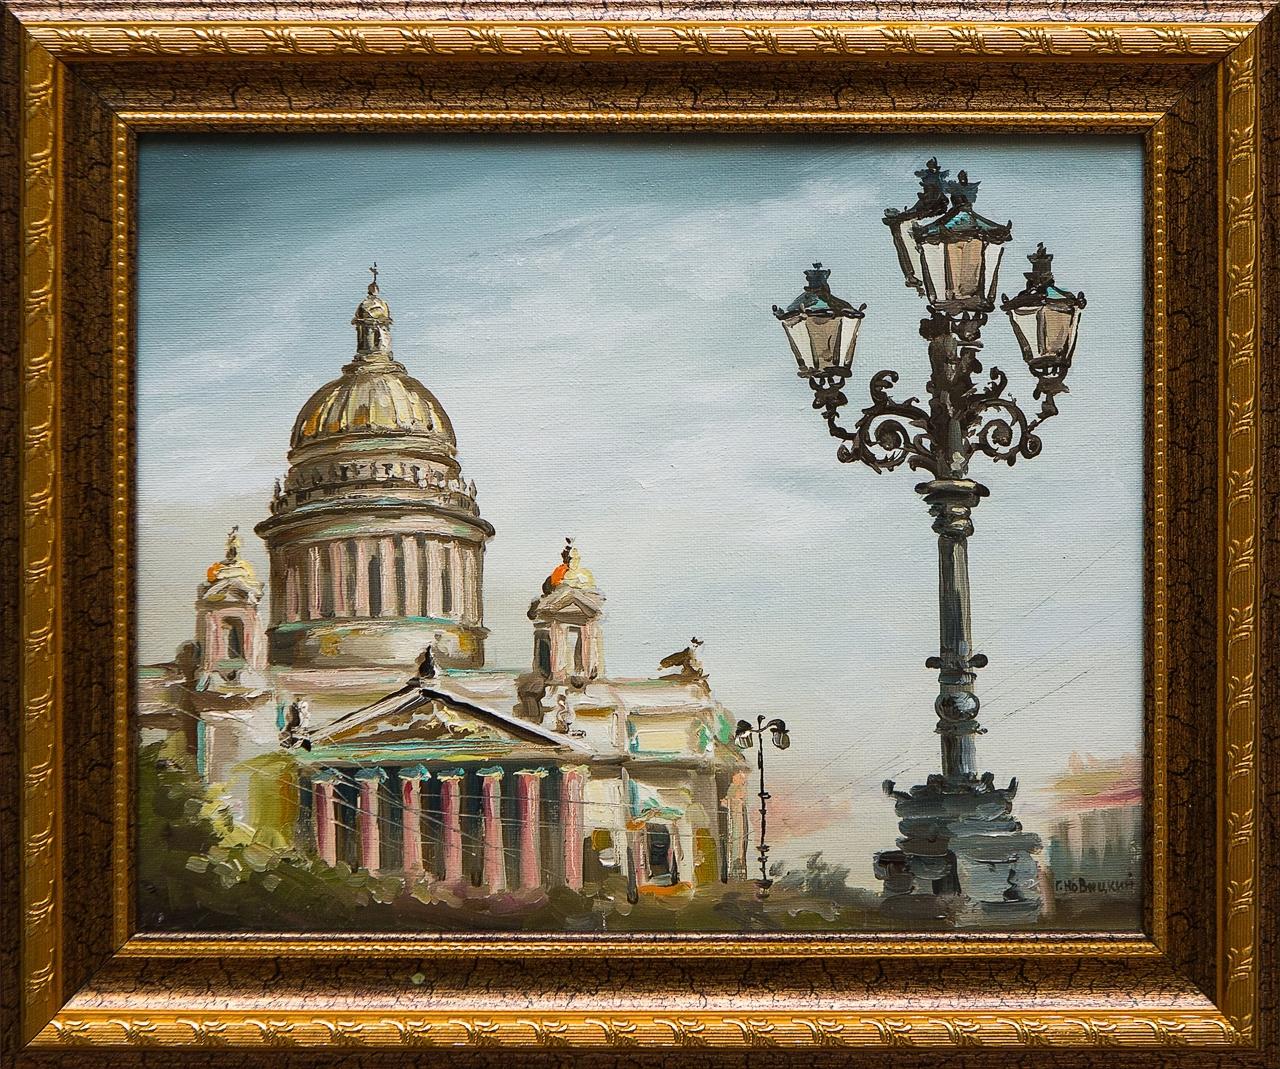 Картина маслом Вид на собор Новицкий картина маслом вид на троицкий собор новицкий